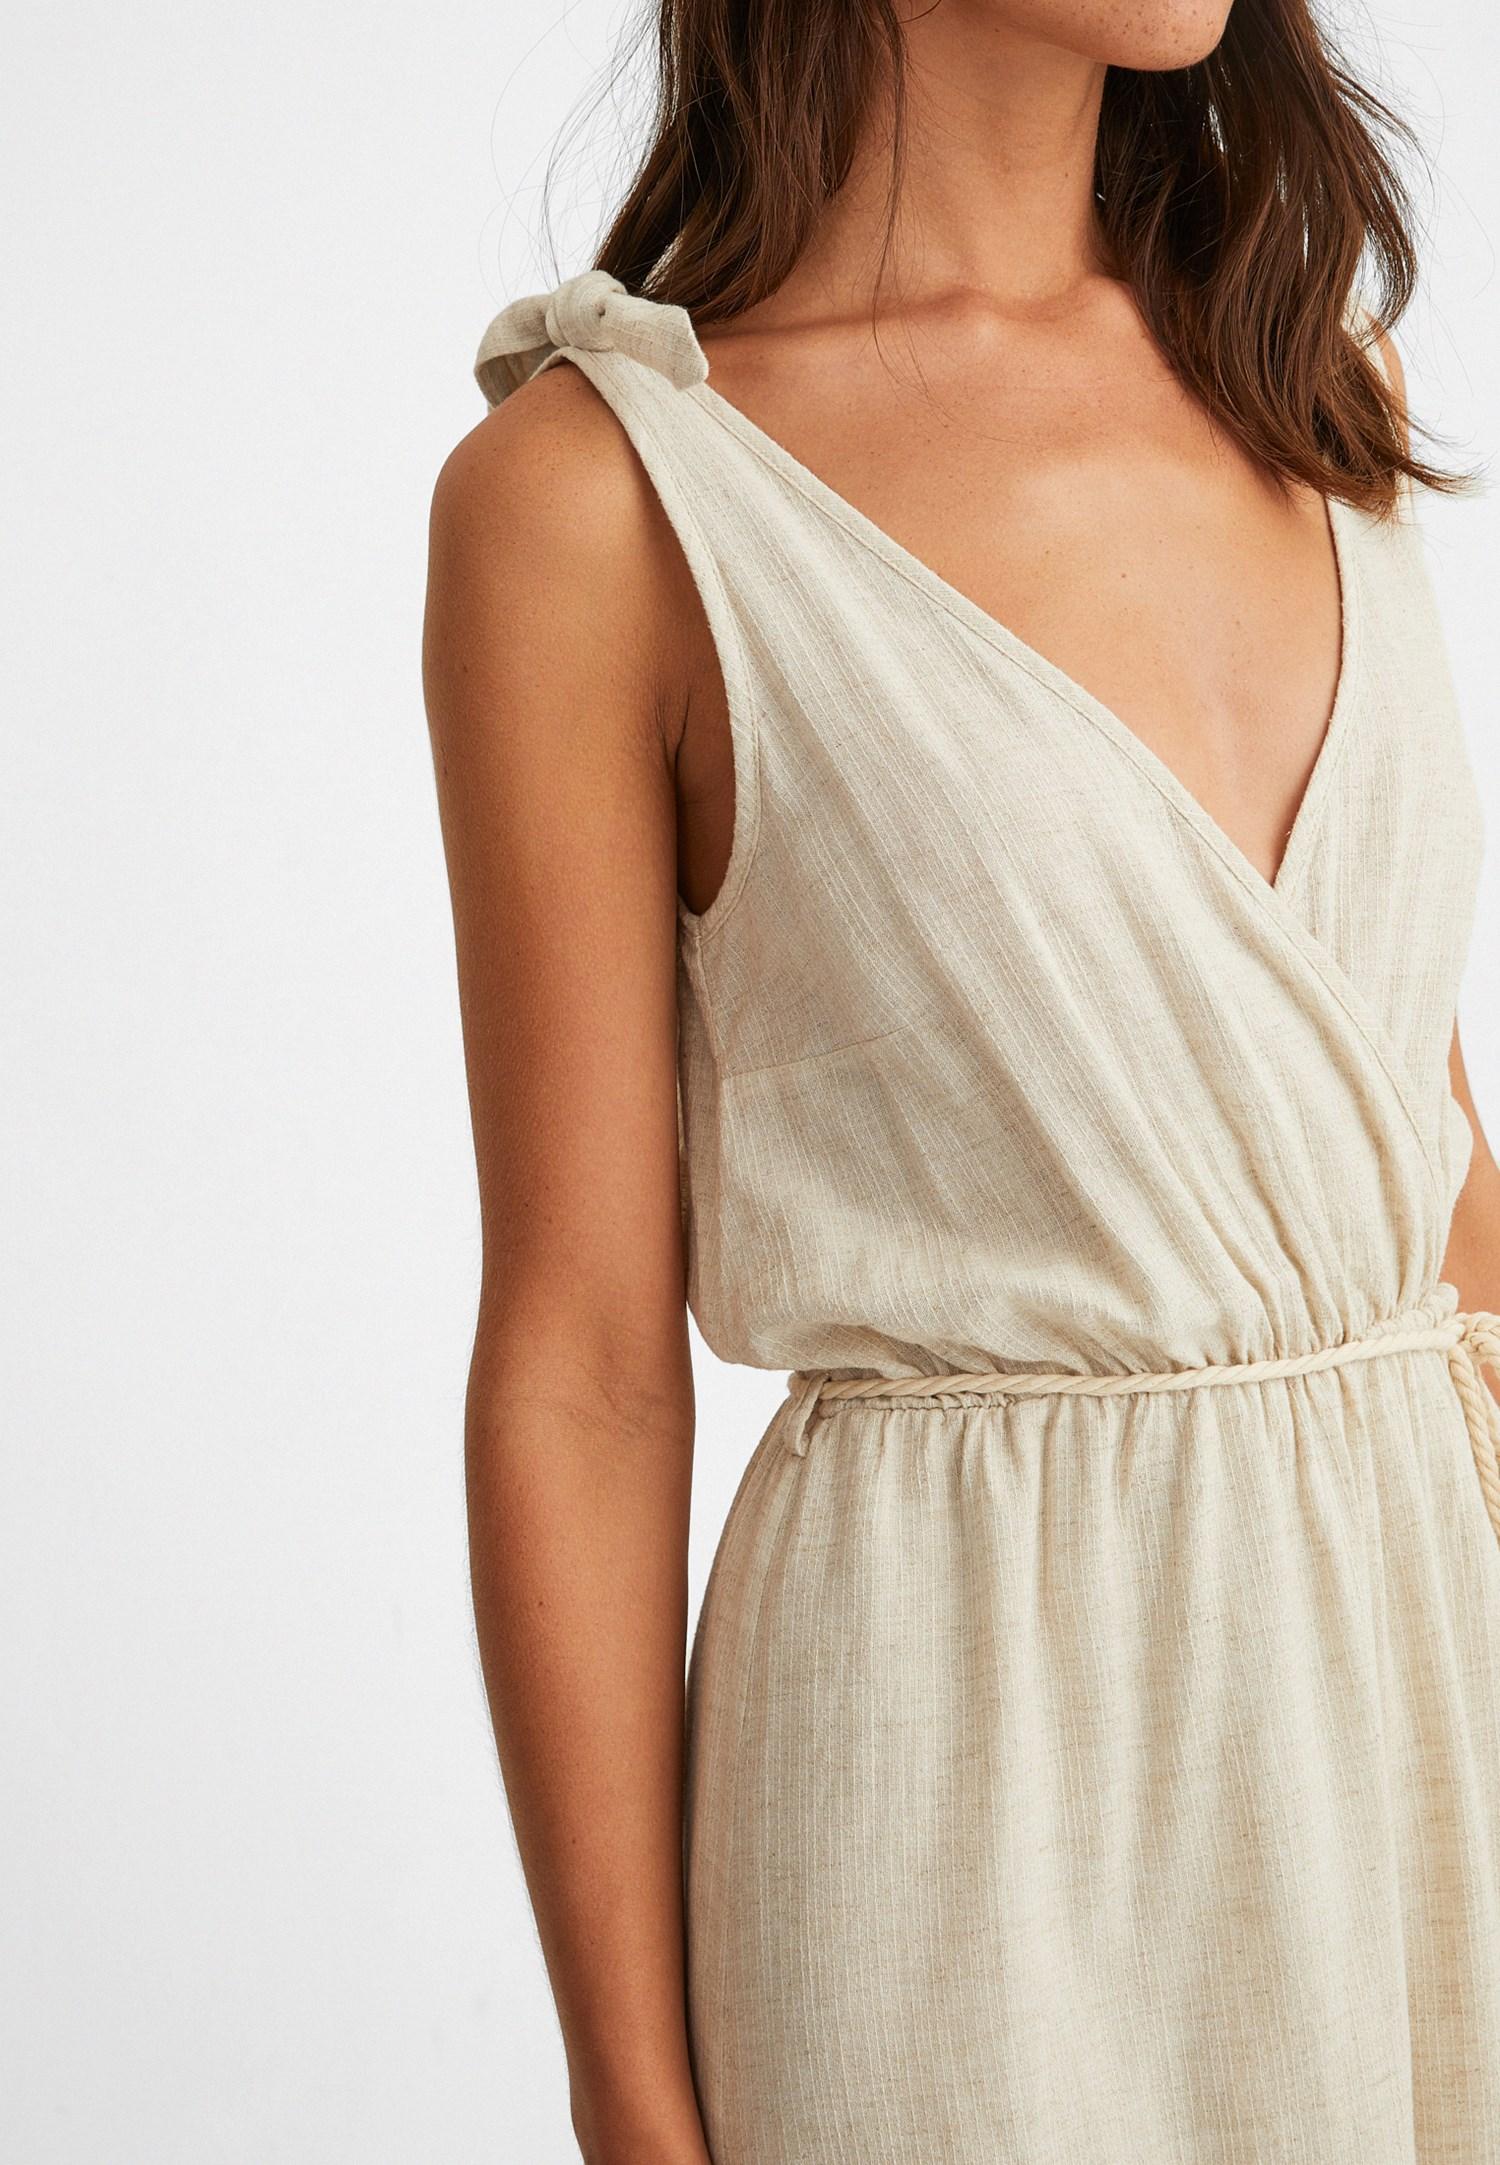 4790b3754f80f Krem Bağlama Detaylı Şort Elbise Online Alışveriş 19YOX-KENSHORTEL ...